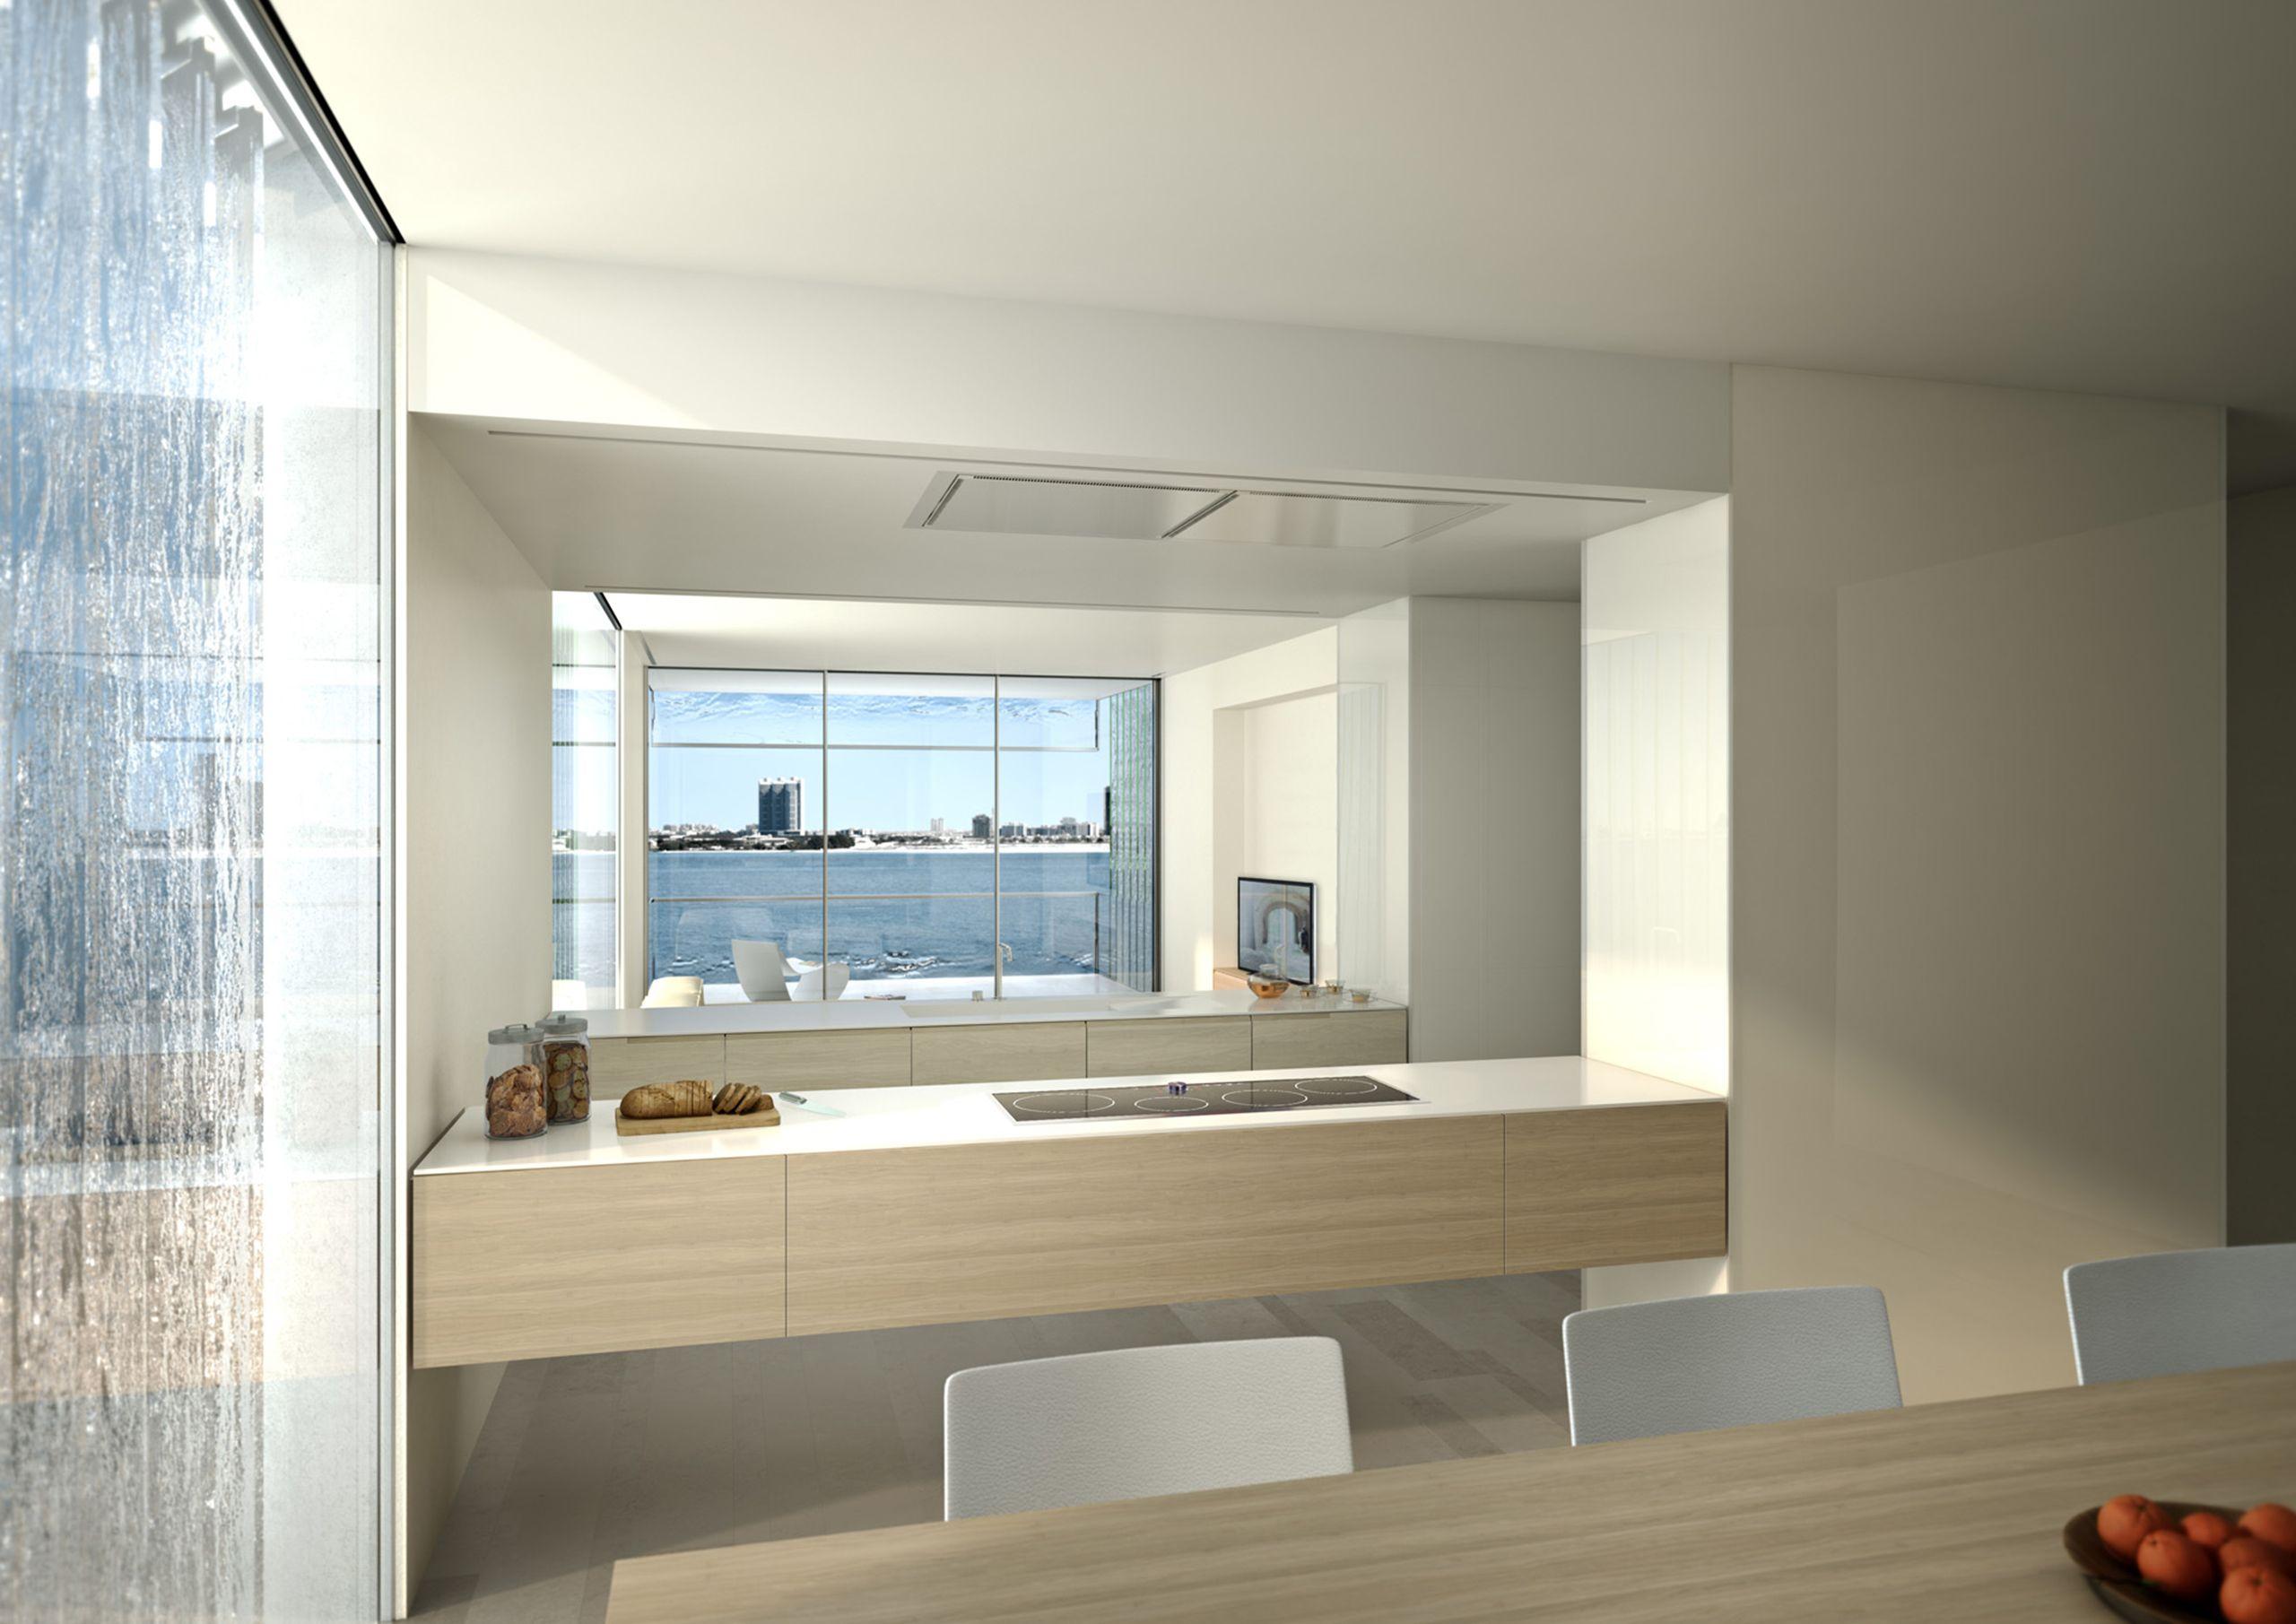 Introducing a new living concept with frameless sliding windows #MurabaDubai #Dubai